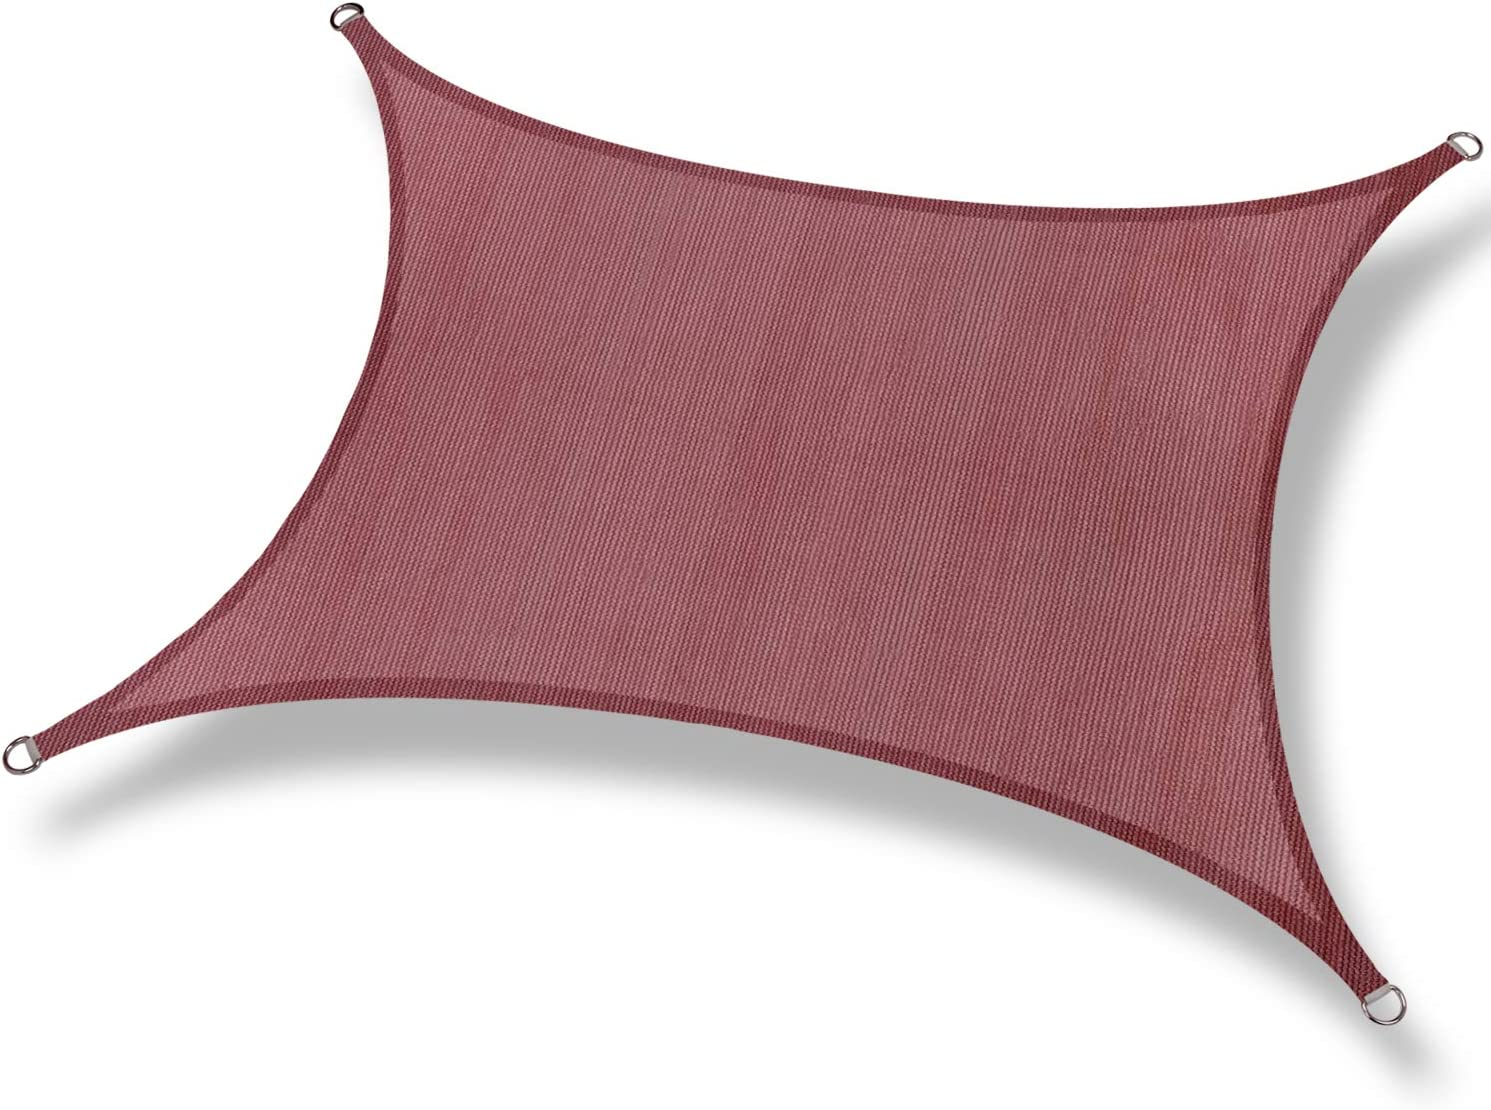 ROYAMY 10' Max Max 48% OFF 52% OFF x Sun Shade Sail UV C Block Shades Rectangle